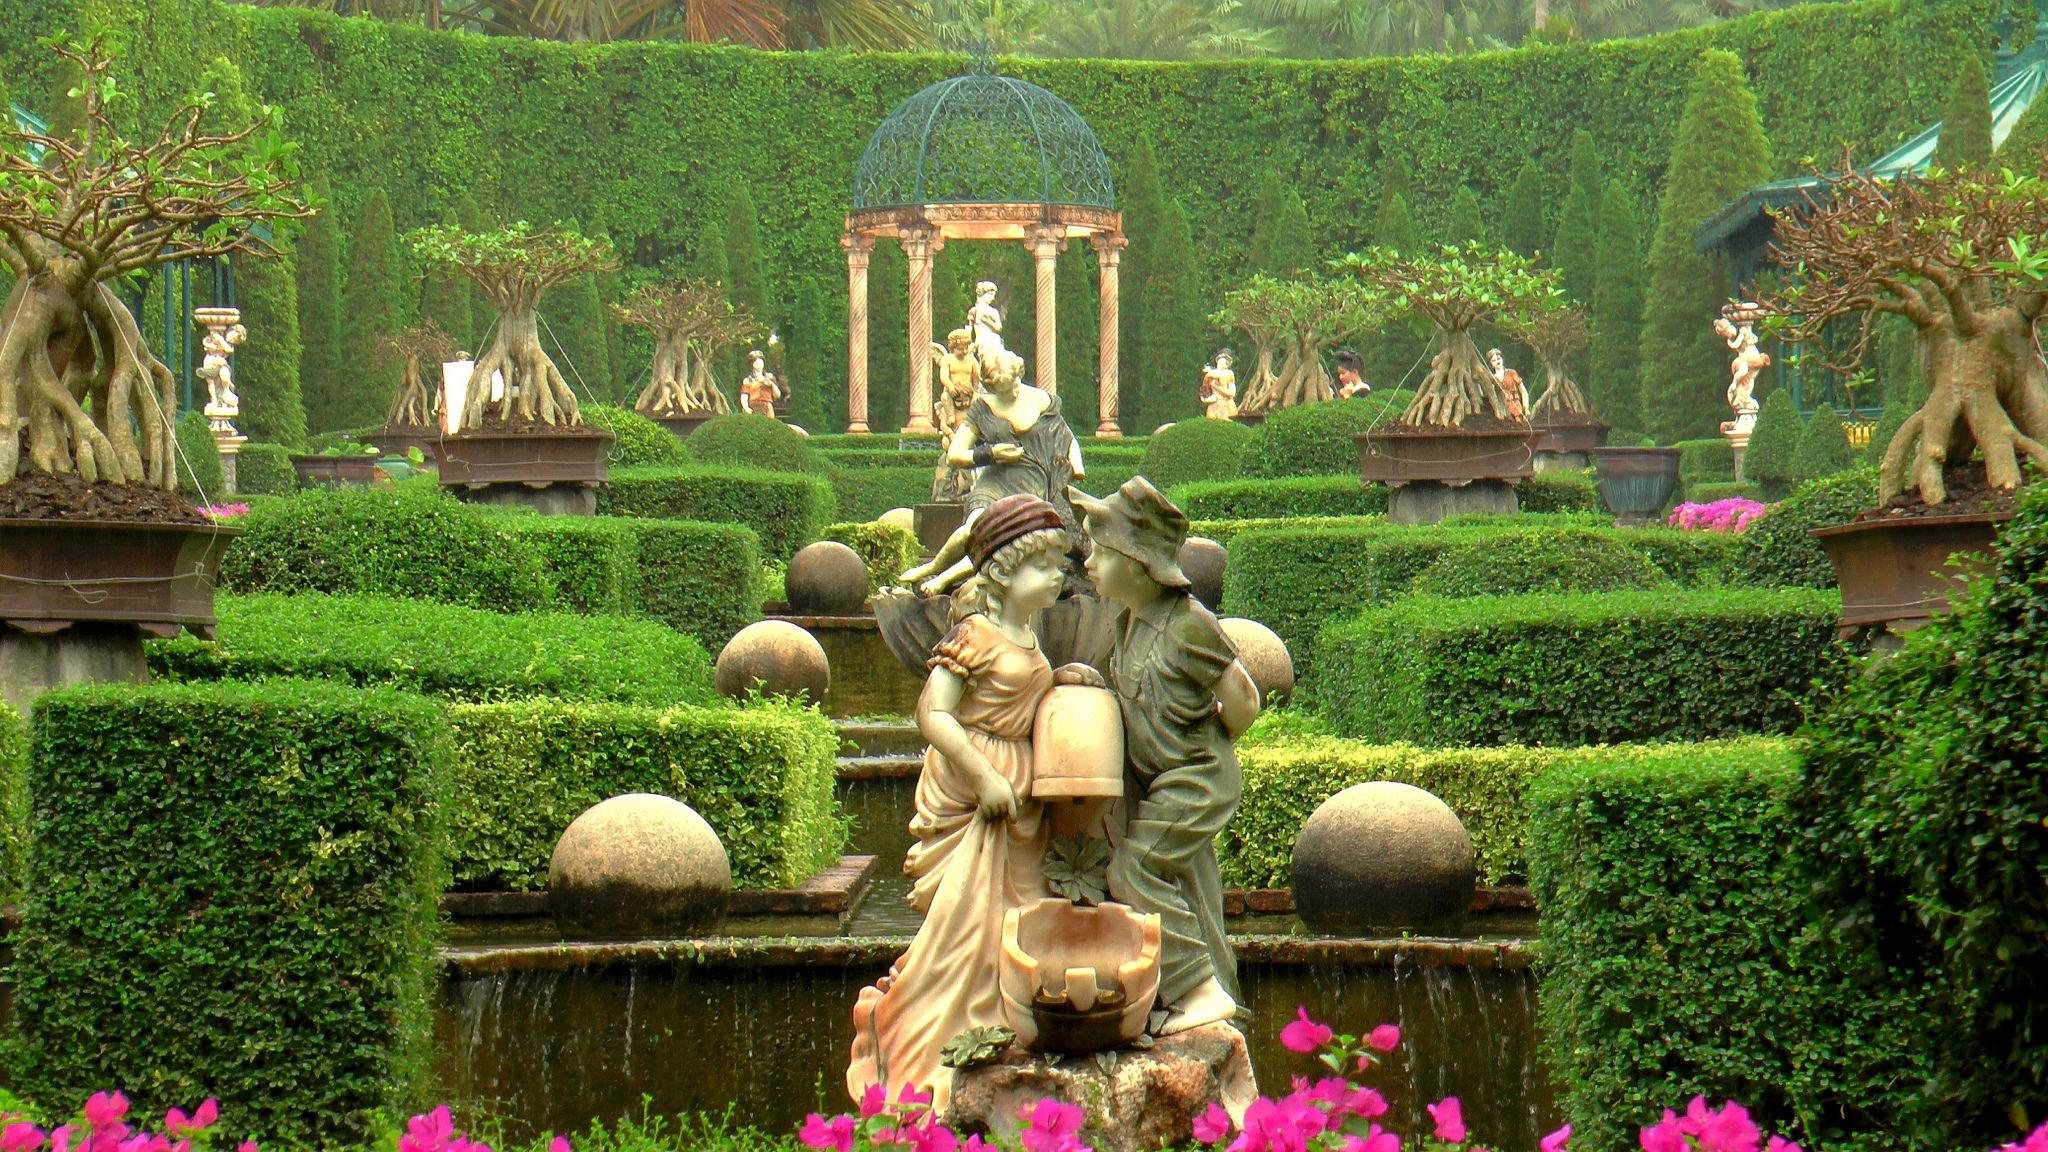 Nong Nooch Tropical Garden - things to do in Pattaya